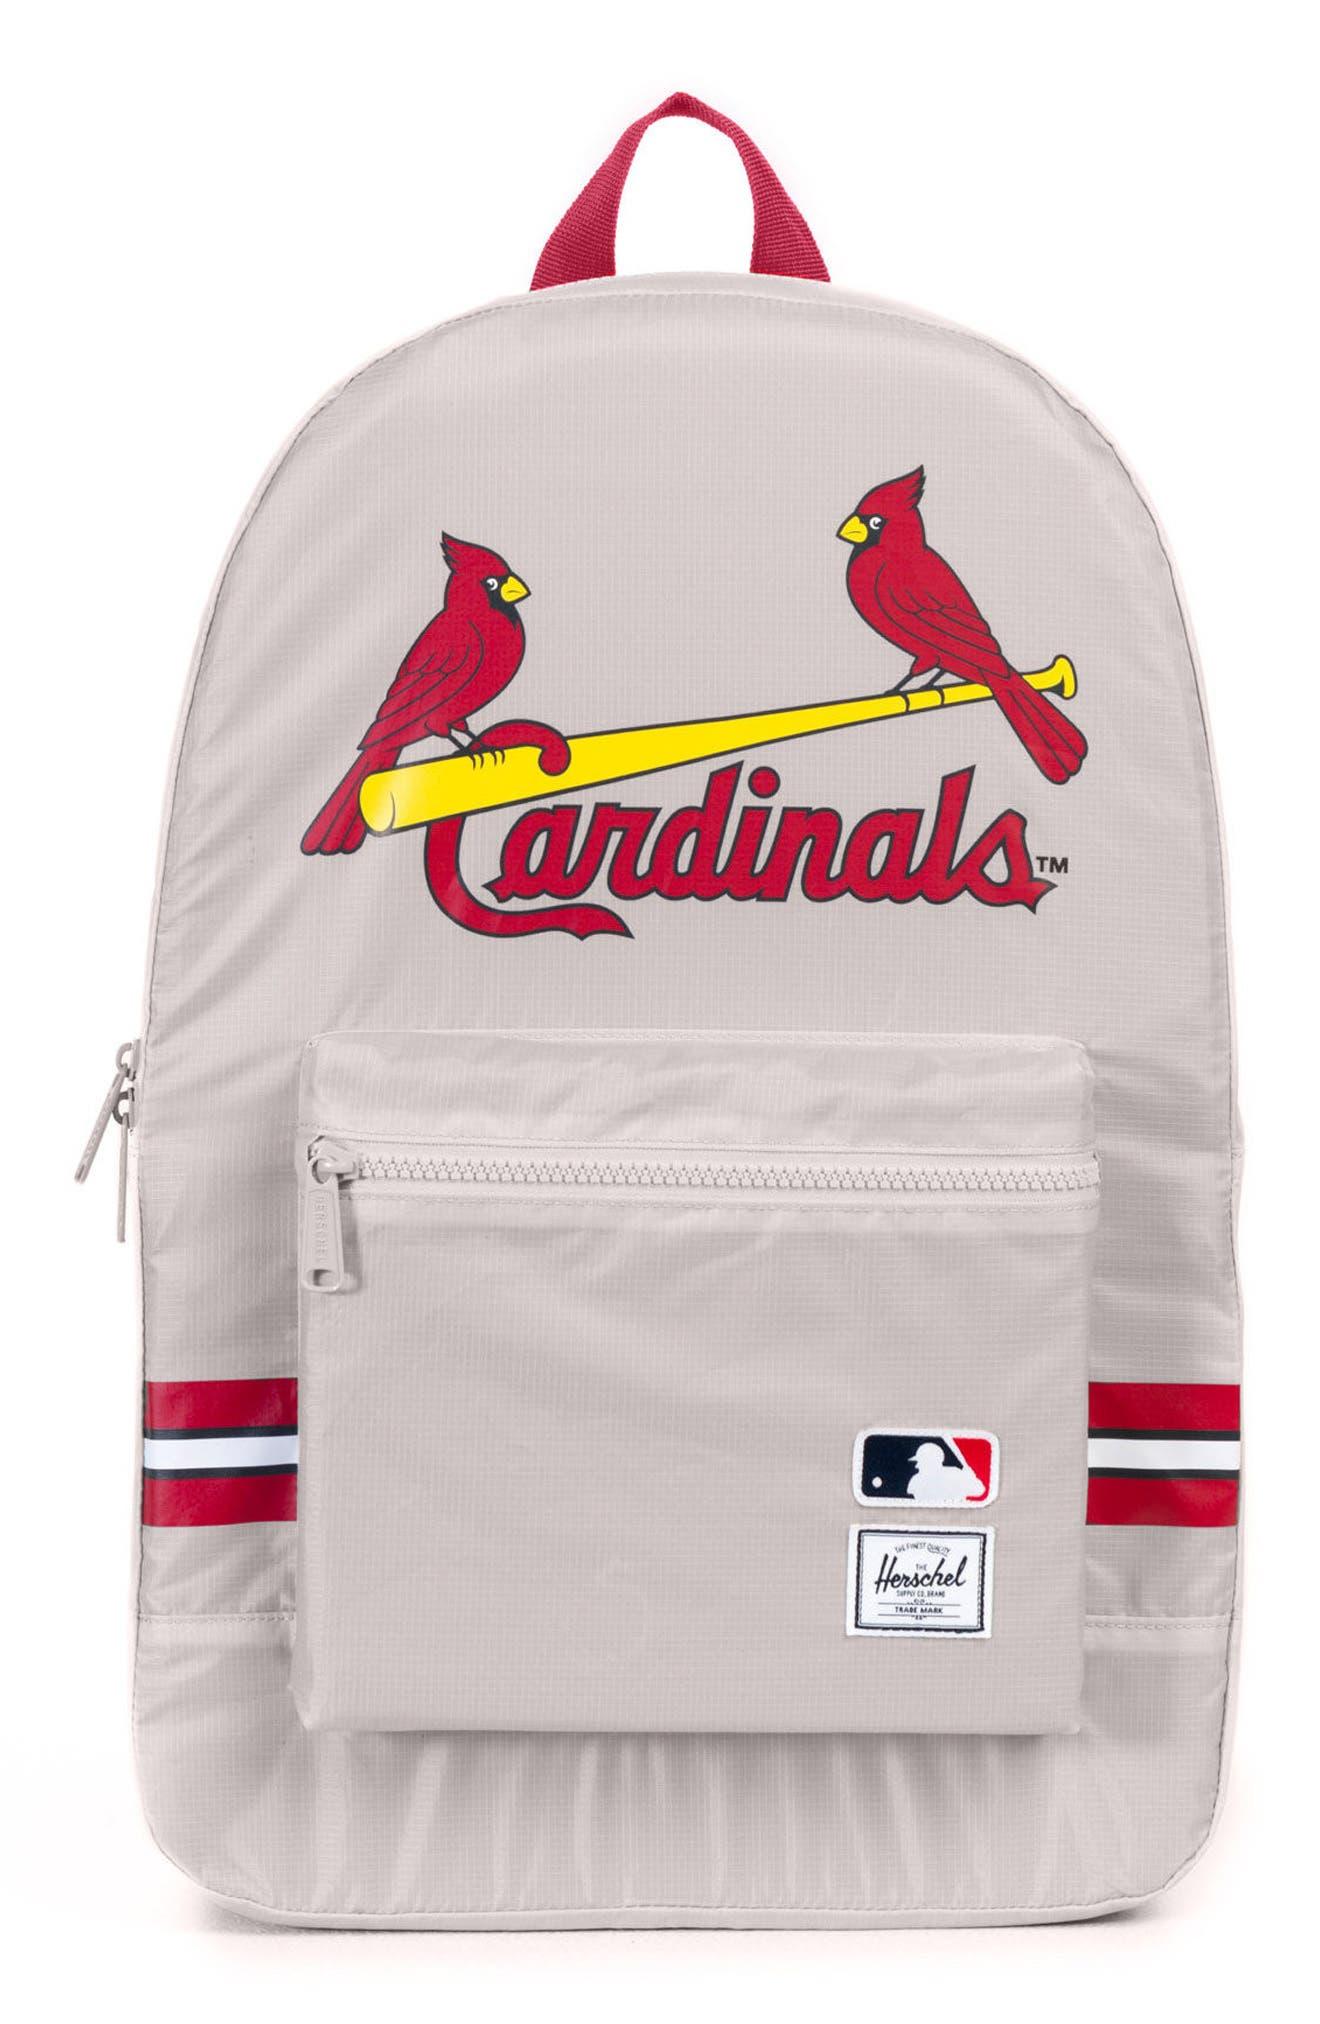 Packable - MLB National League Backpack,                             Main thumbnail 1, color,                             ST LOUIS CARDINALS